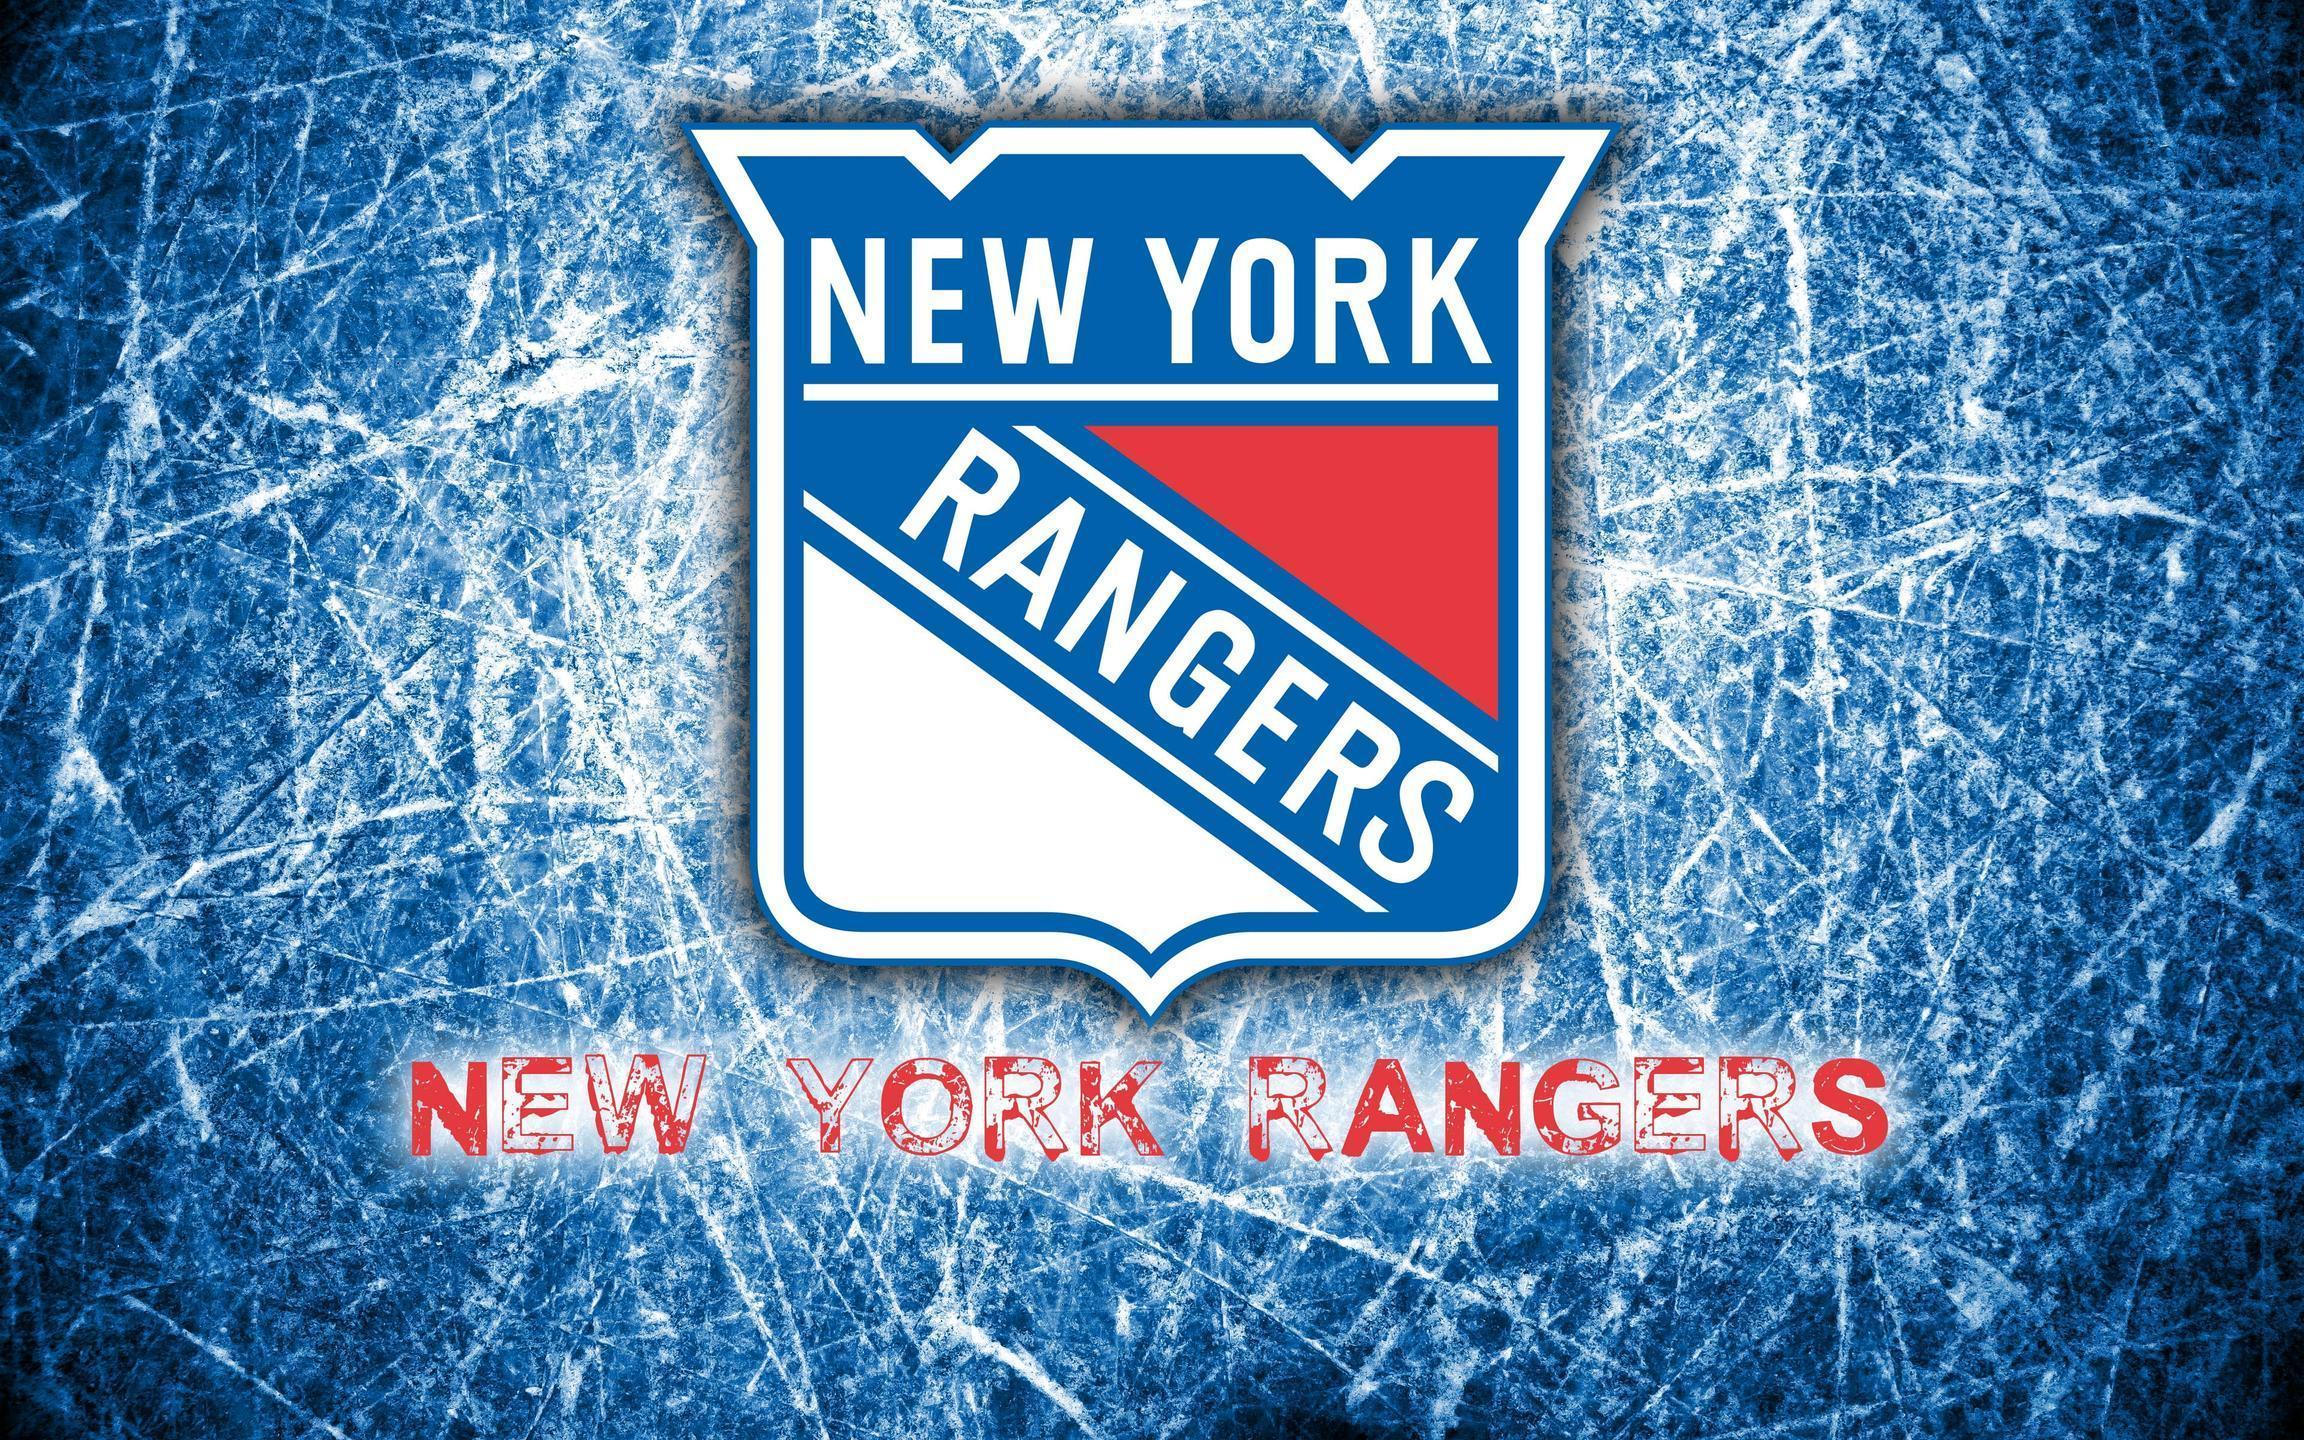 New York Rangers Wallpapers 2304x1440